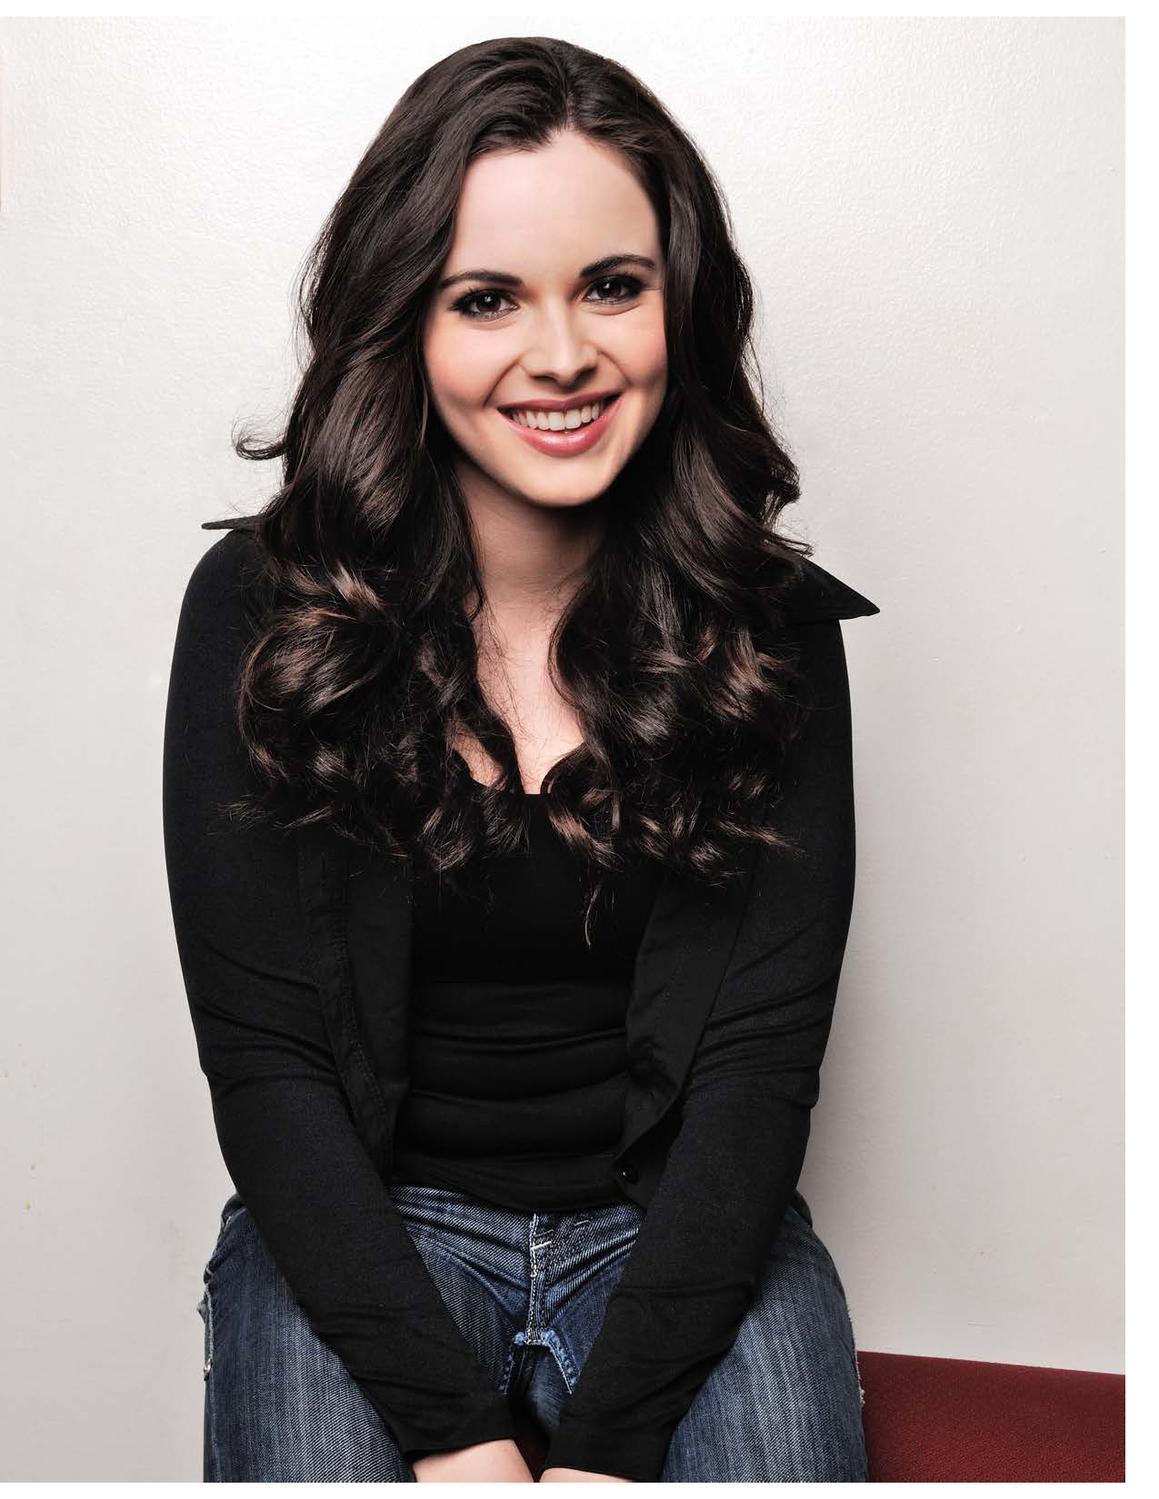 Celebrity Pics: Vanessa Marano